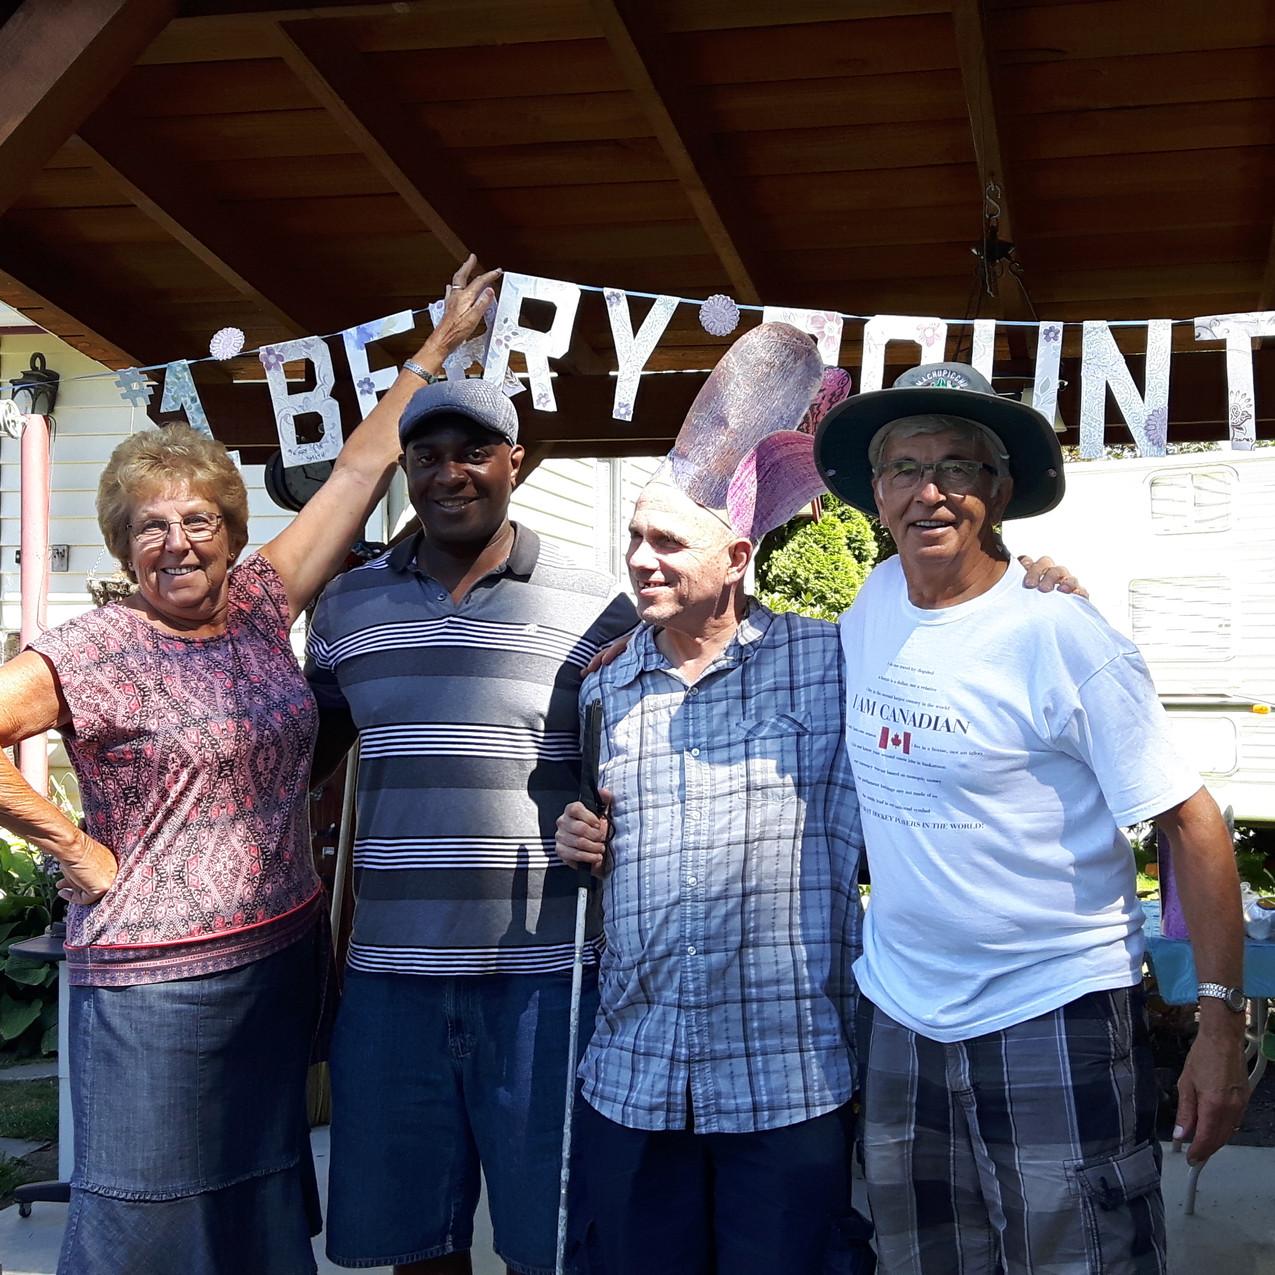 Berry Bounty Farm